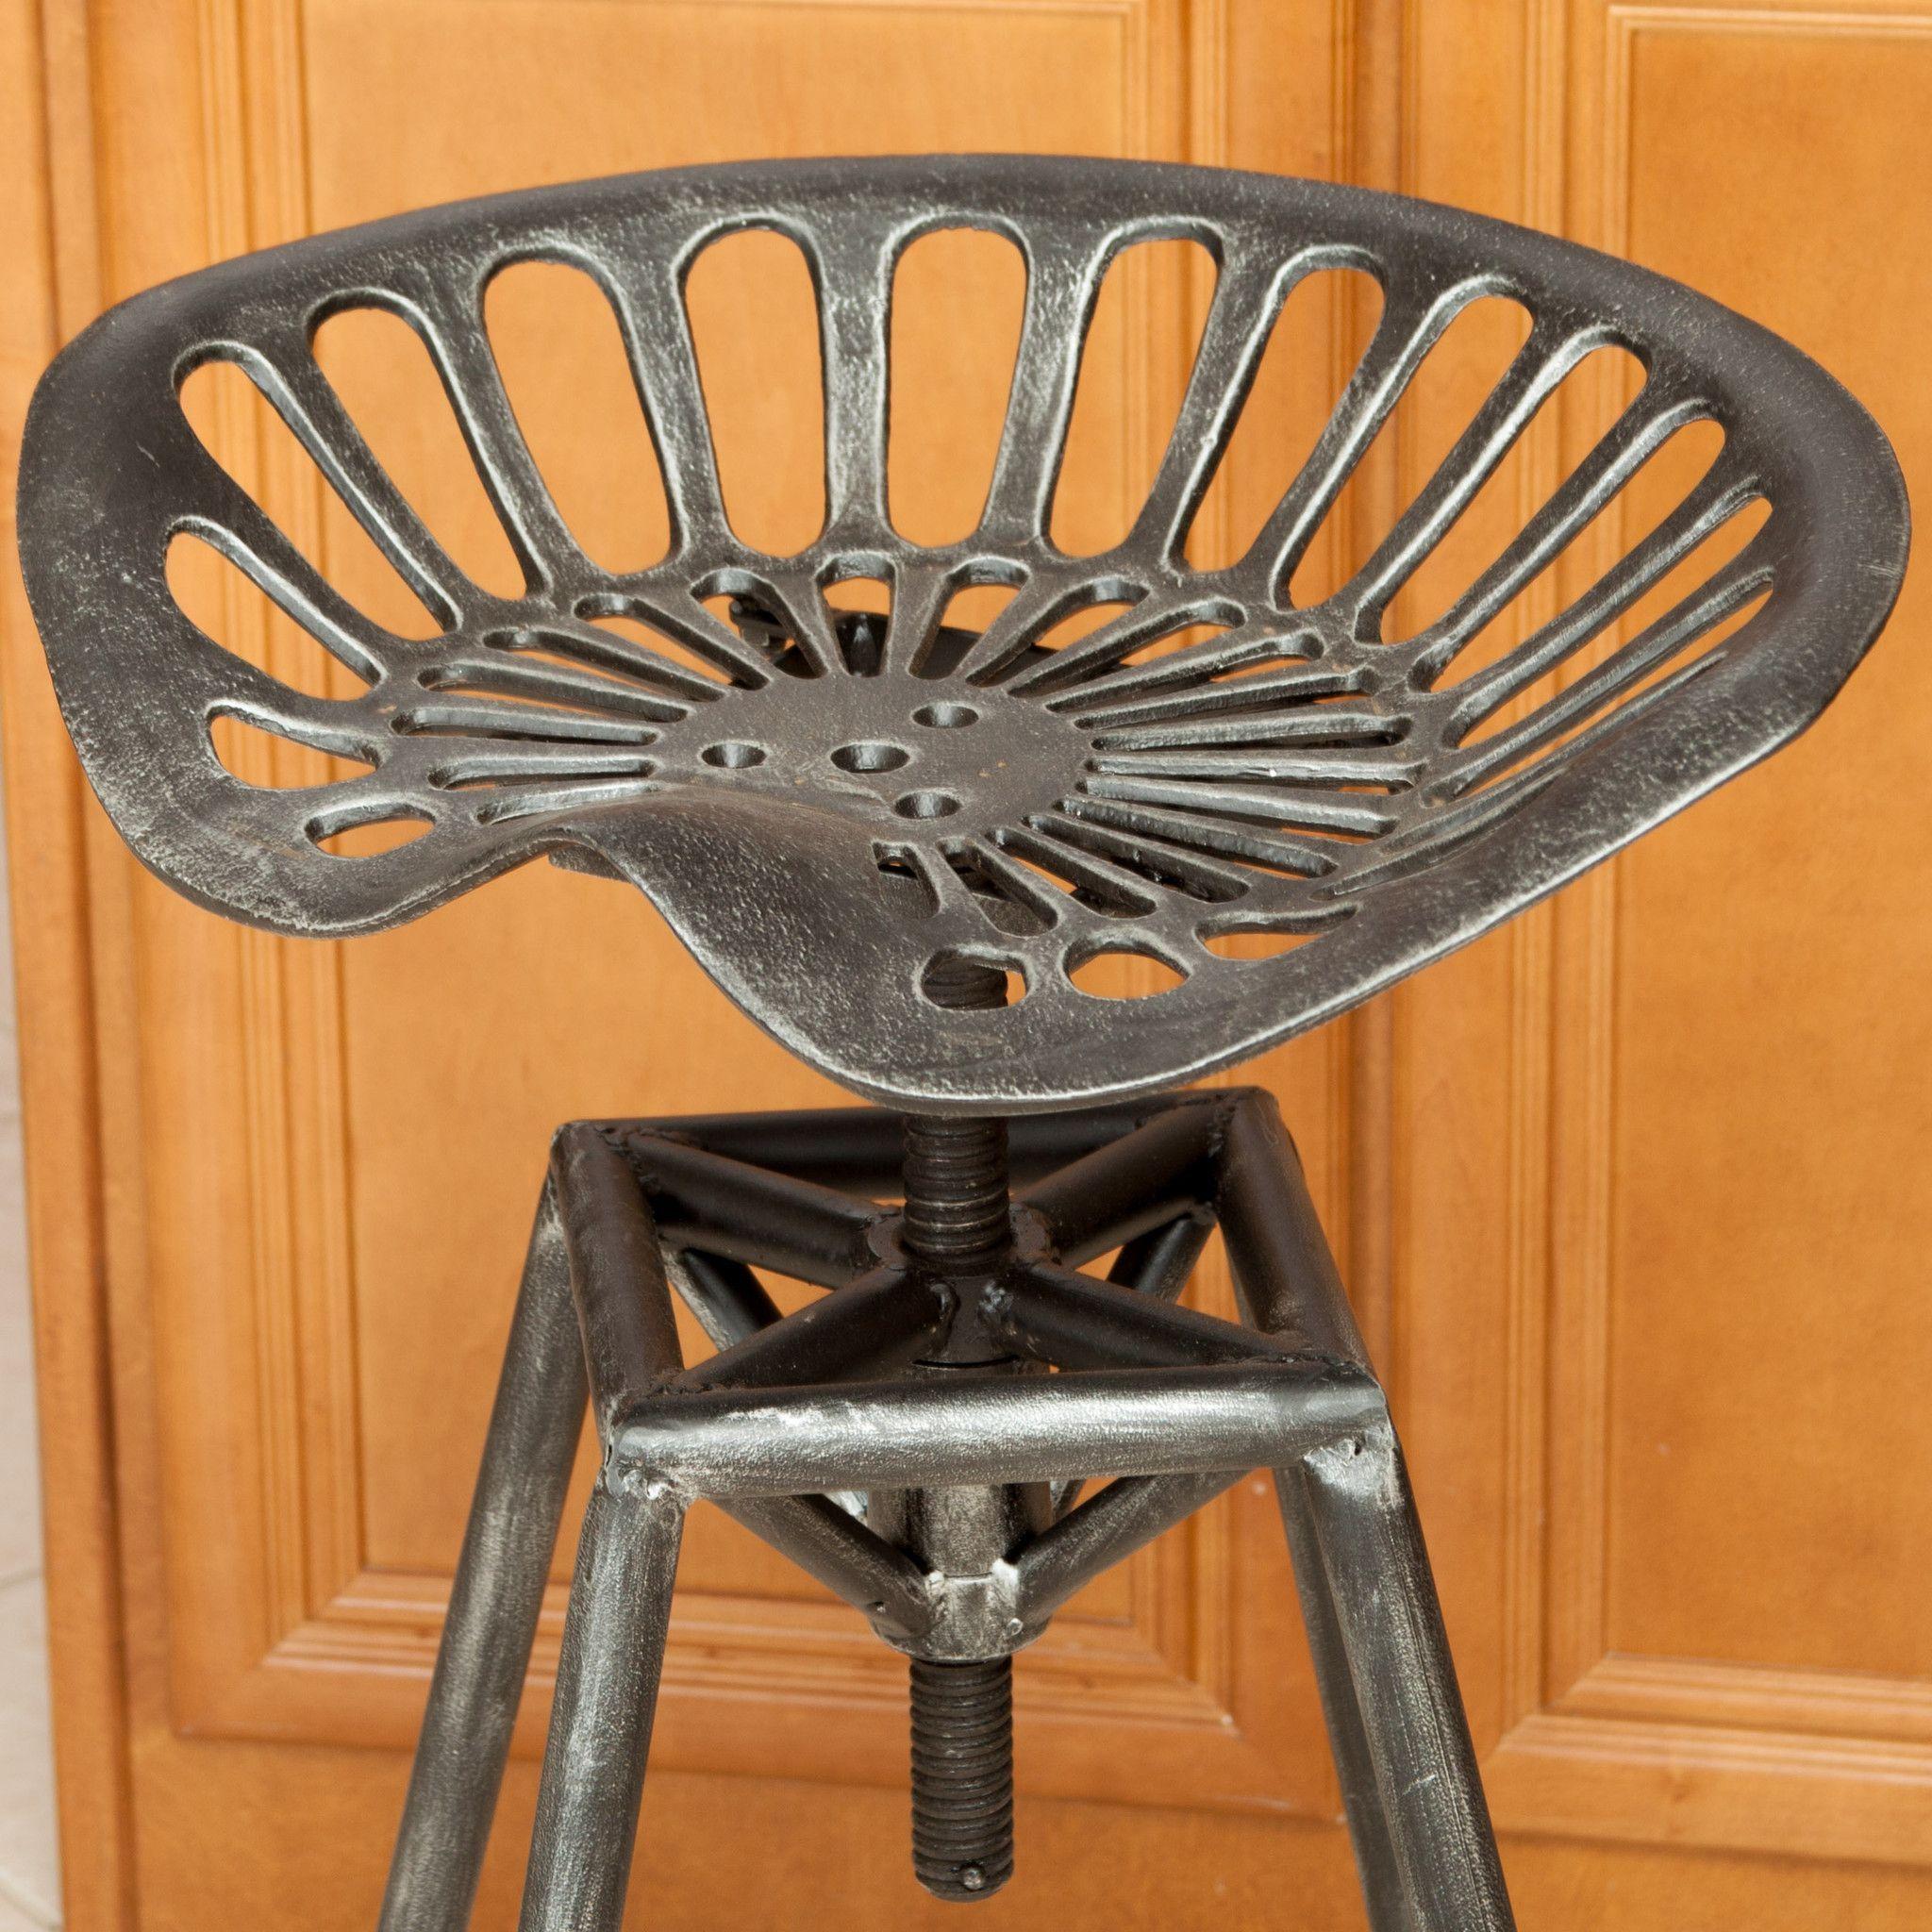 Groovy Charlie Industrial Metal Design Tractor Seat Adjustable Bar Ibusinesslaw Wood Chair Design Ideas Ibusinesslaworg